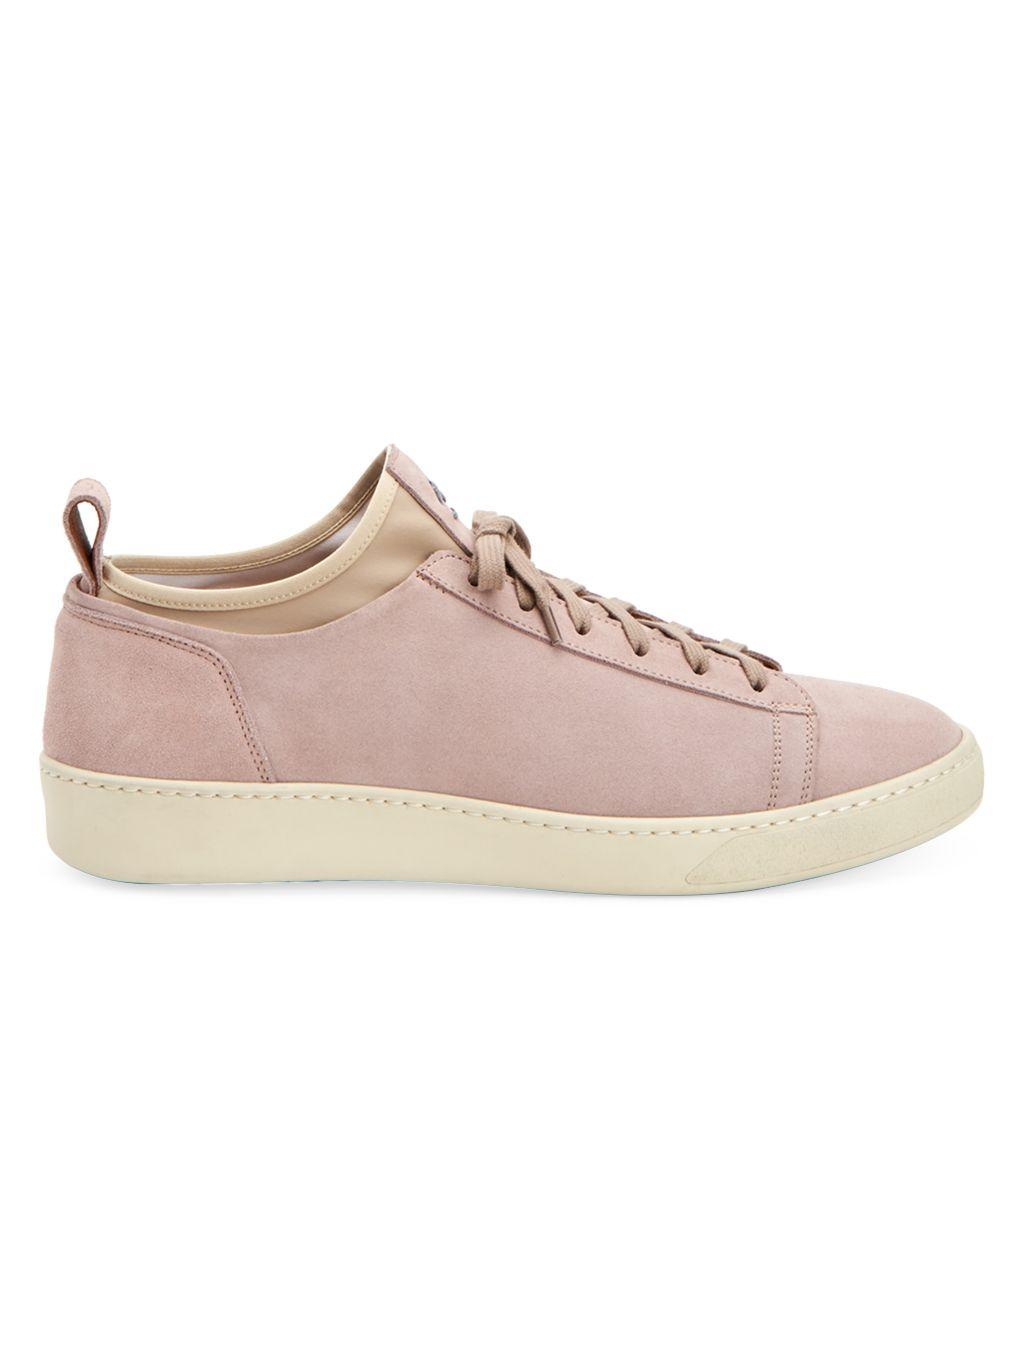 Aquatalia Sock-Lined Sneakers